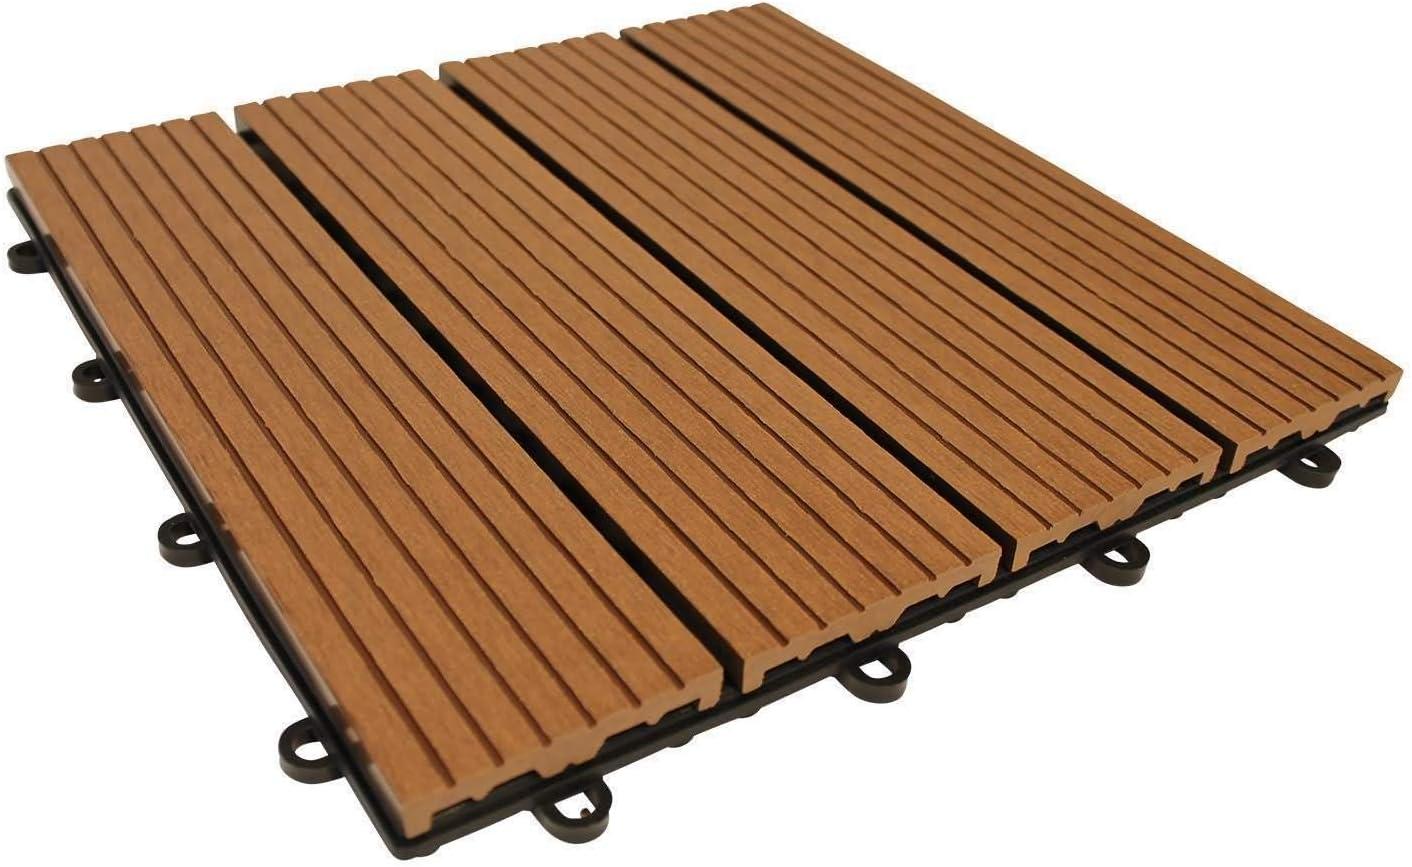 Top-Multi WPC Holz Fliese 30x30cm Light Brown 1m/² 1m/²=11 Fliesen